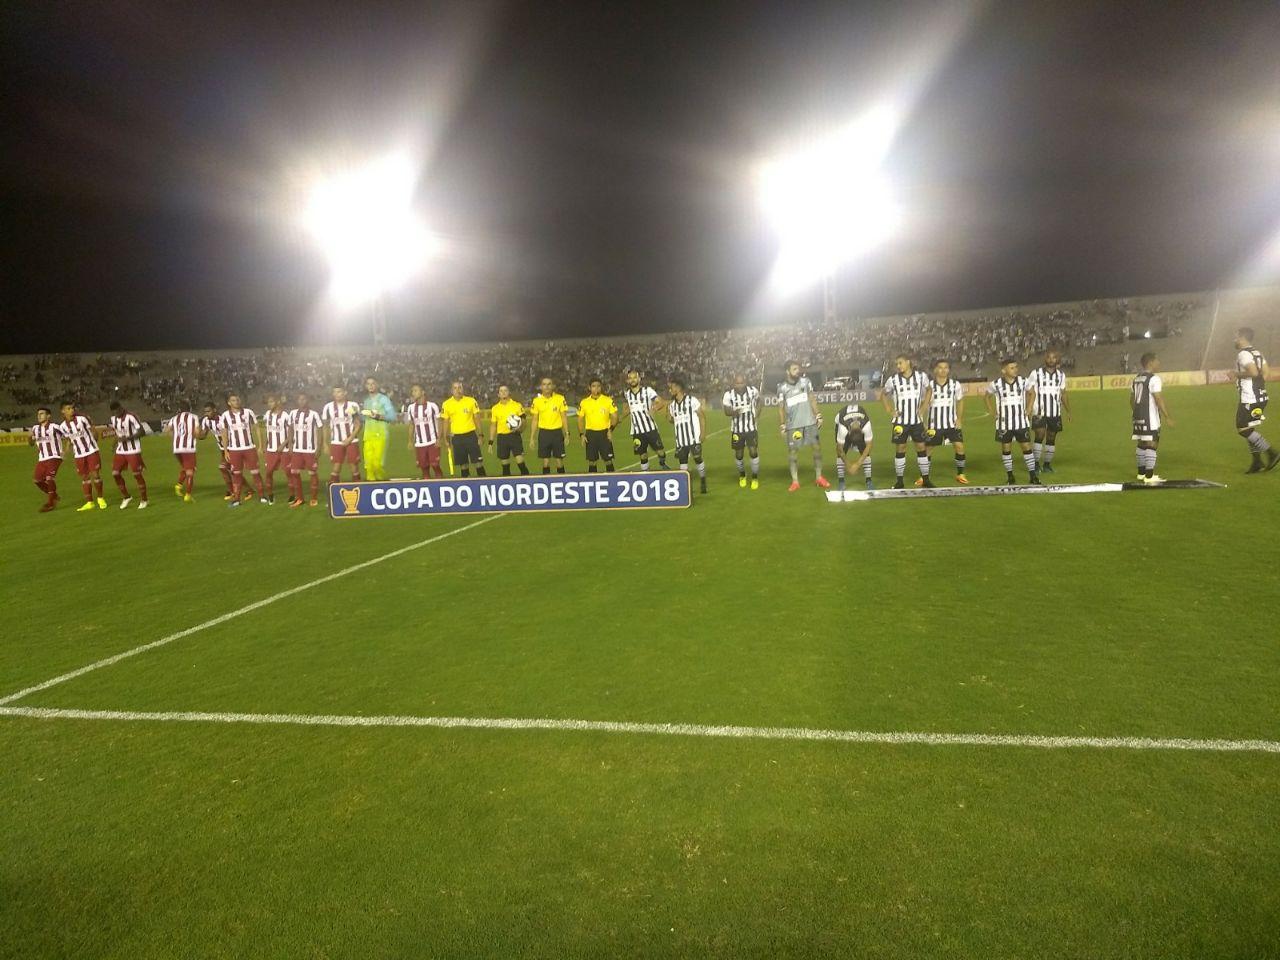 Botafogo-PB vence o Náutico e se isola no topo